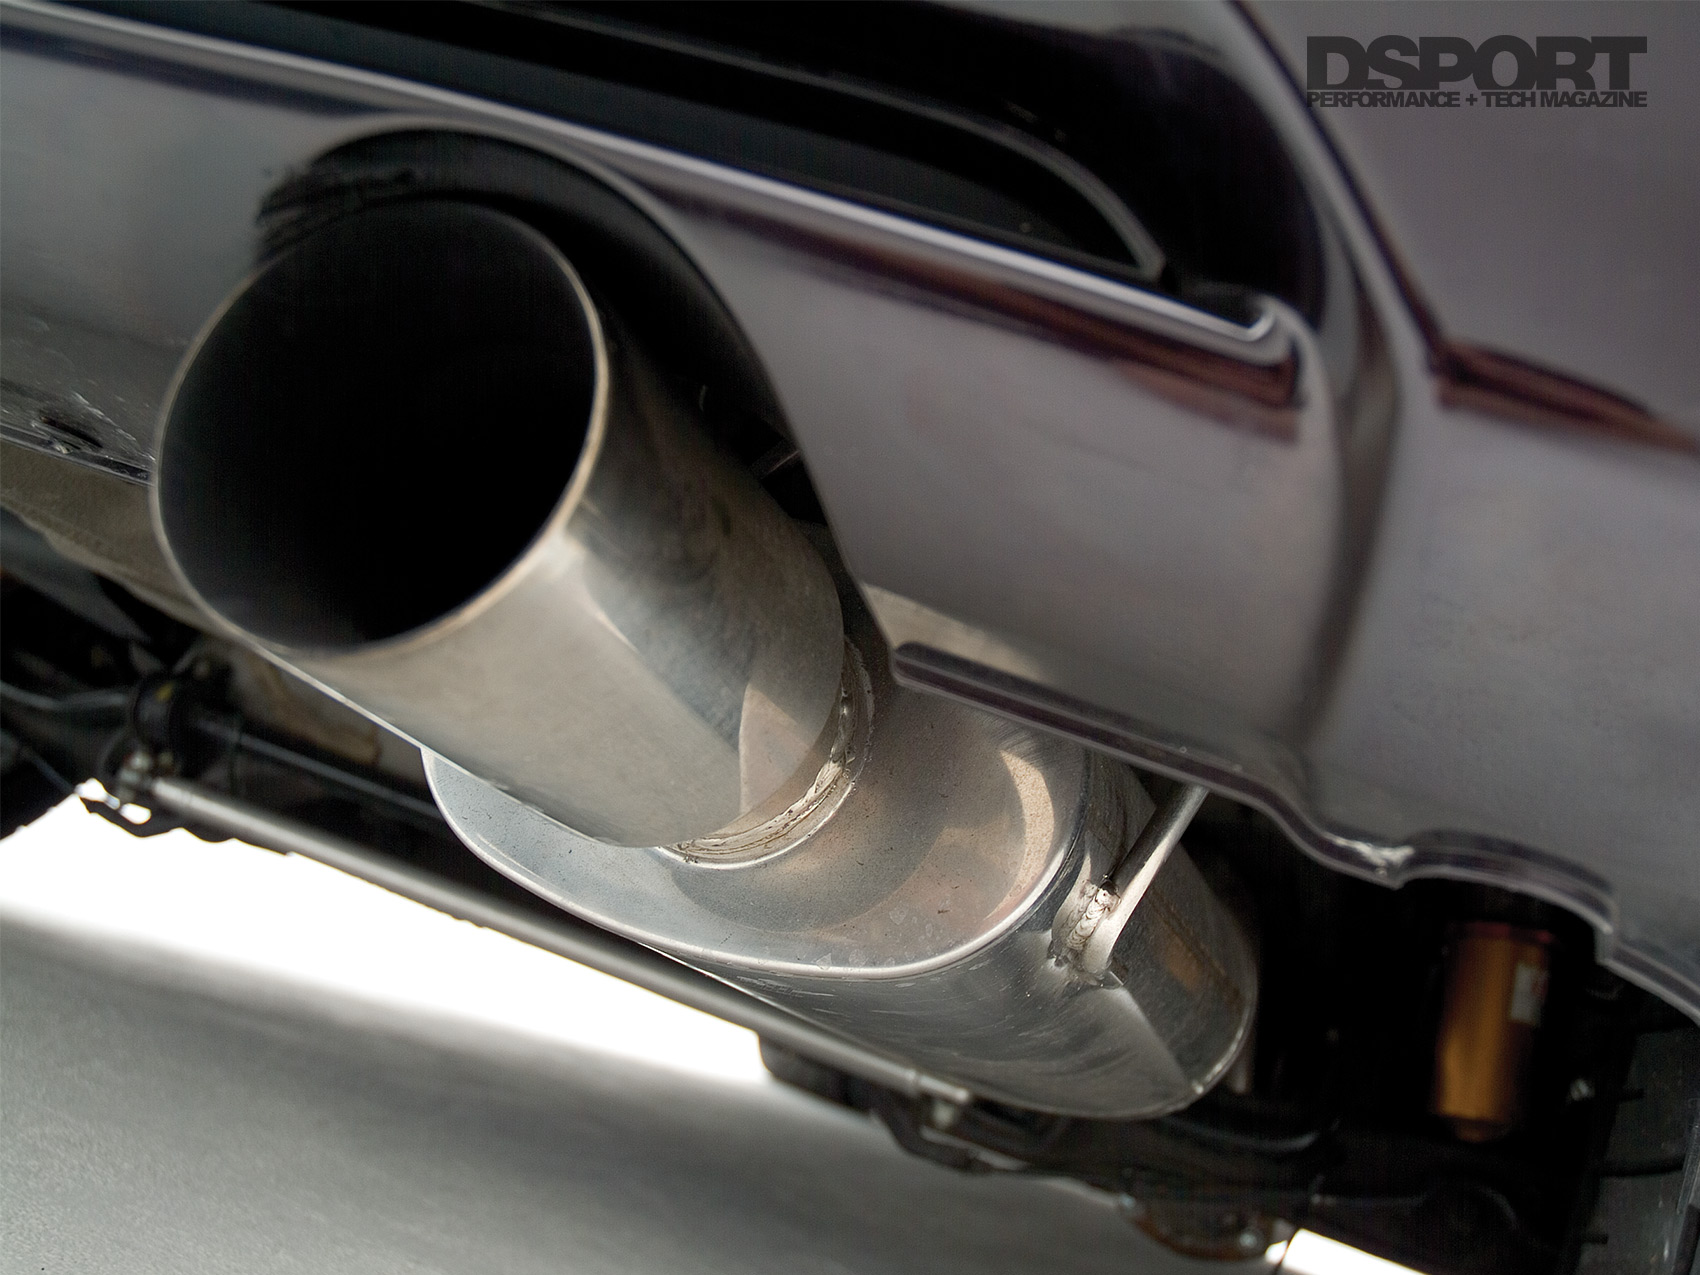 db7 integra exhaust